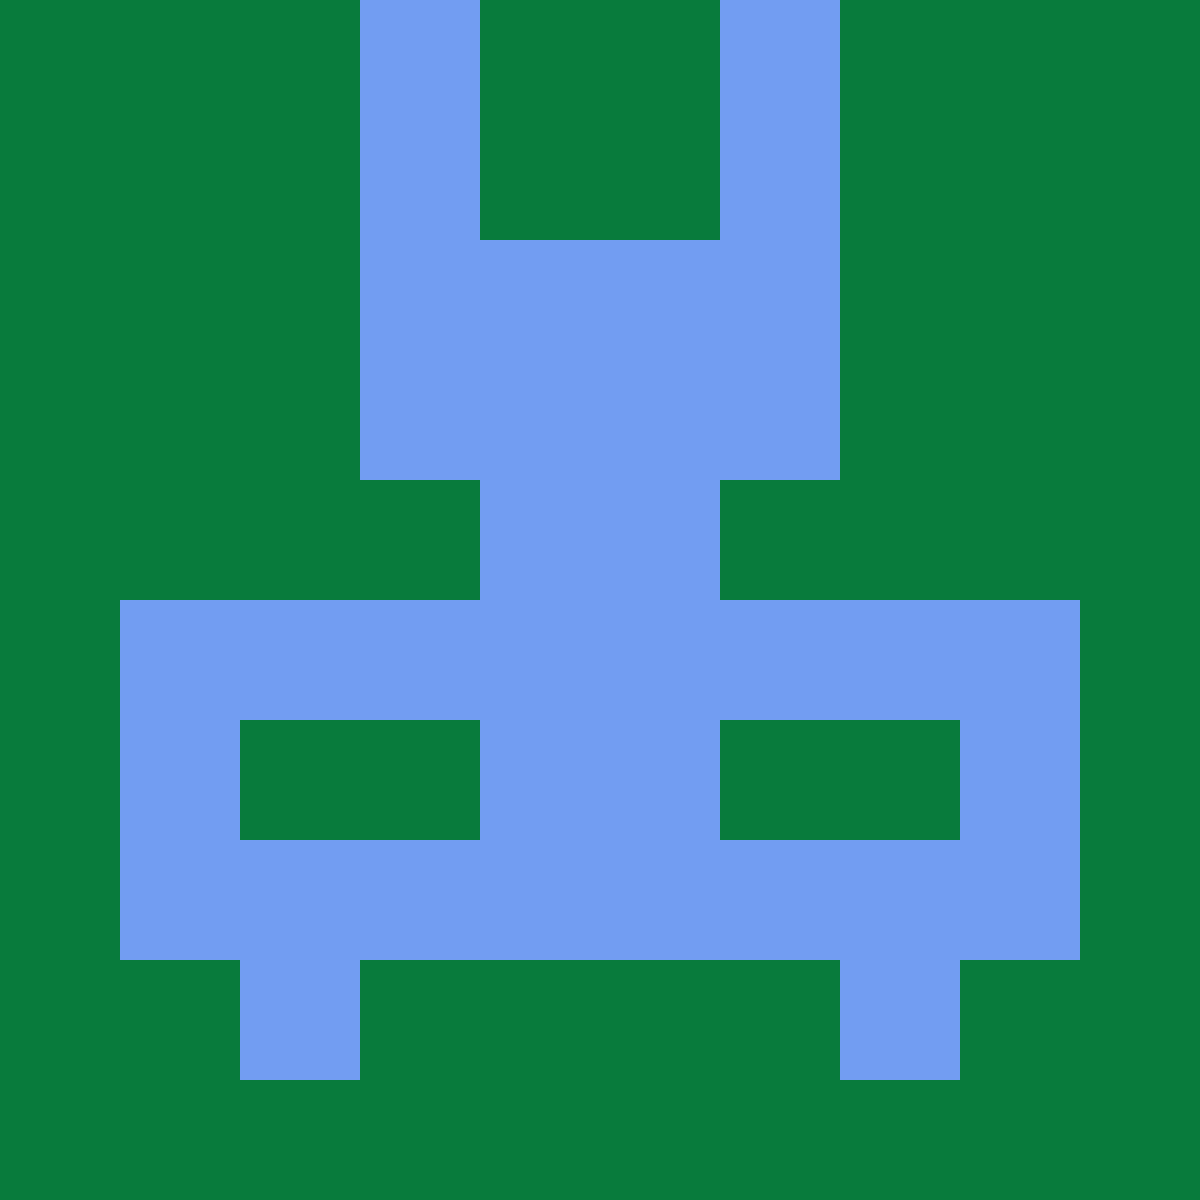 herrernst/librespot - Packages · packagecloud